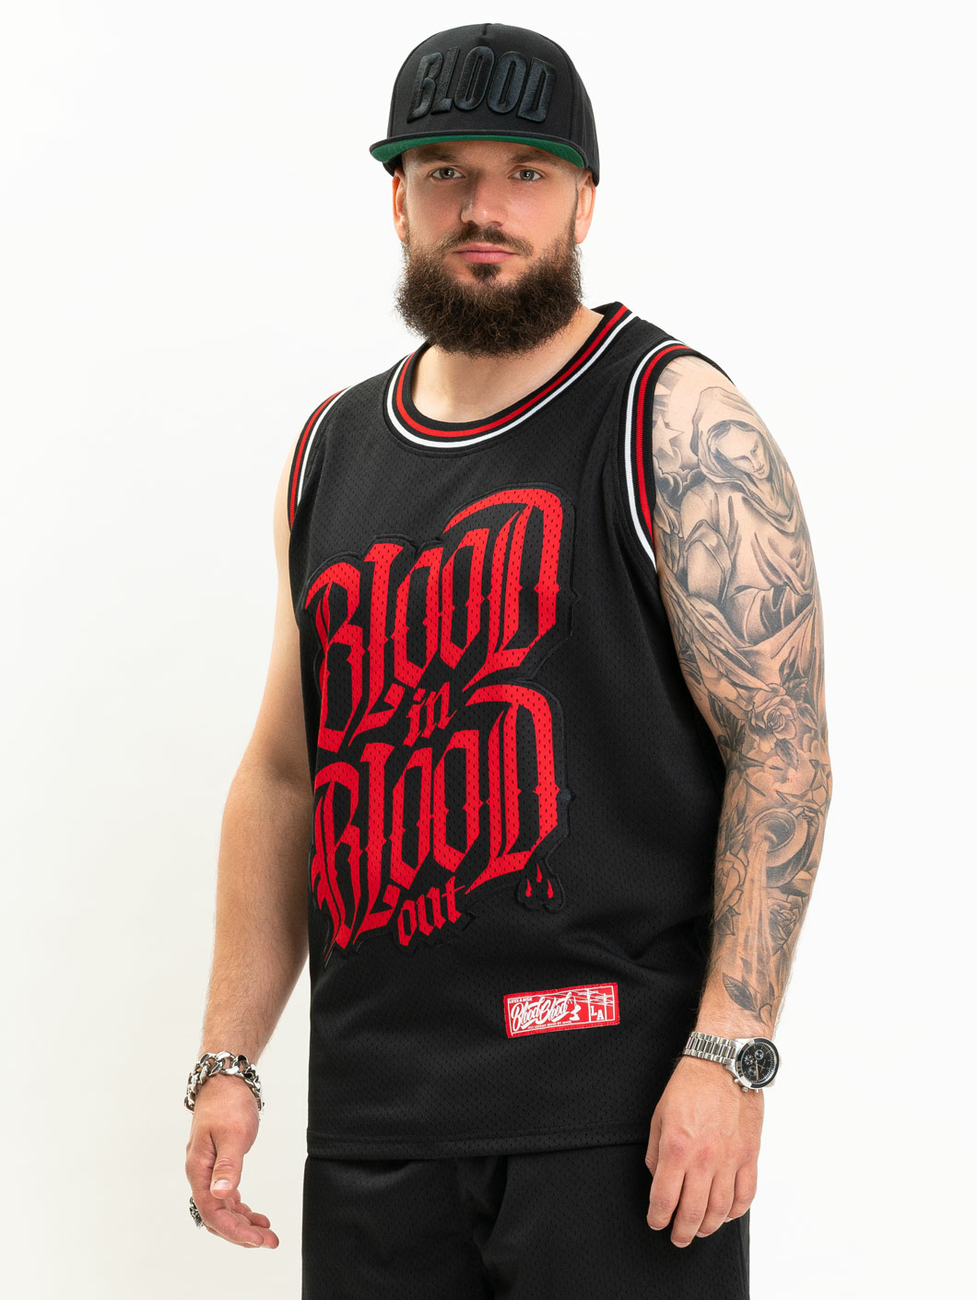 Blood In Blood Out Aguas Mesh Tanktop XL